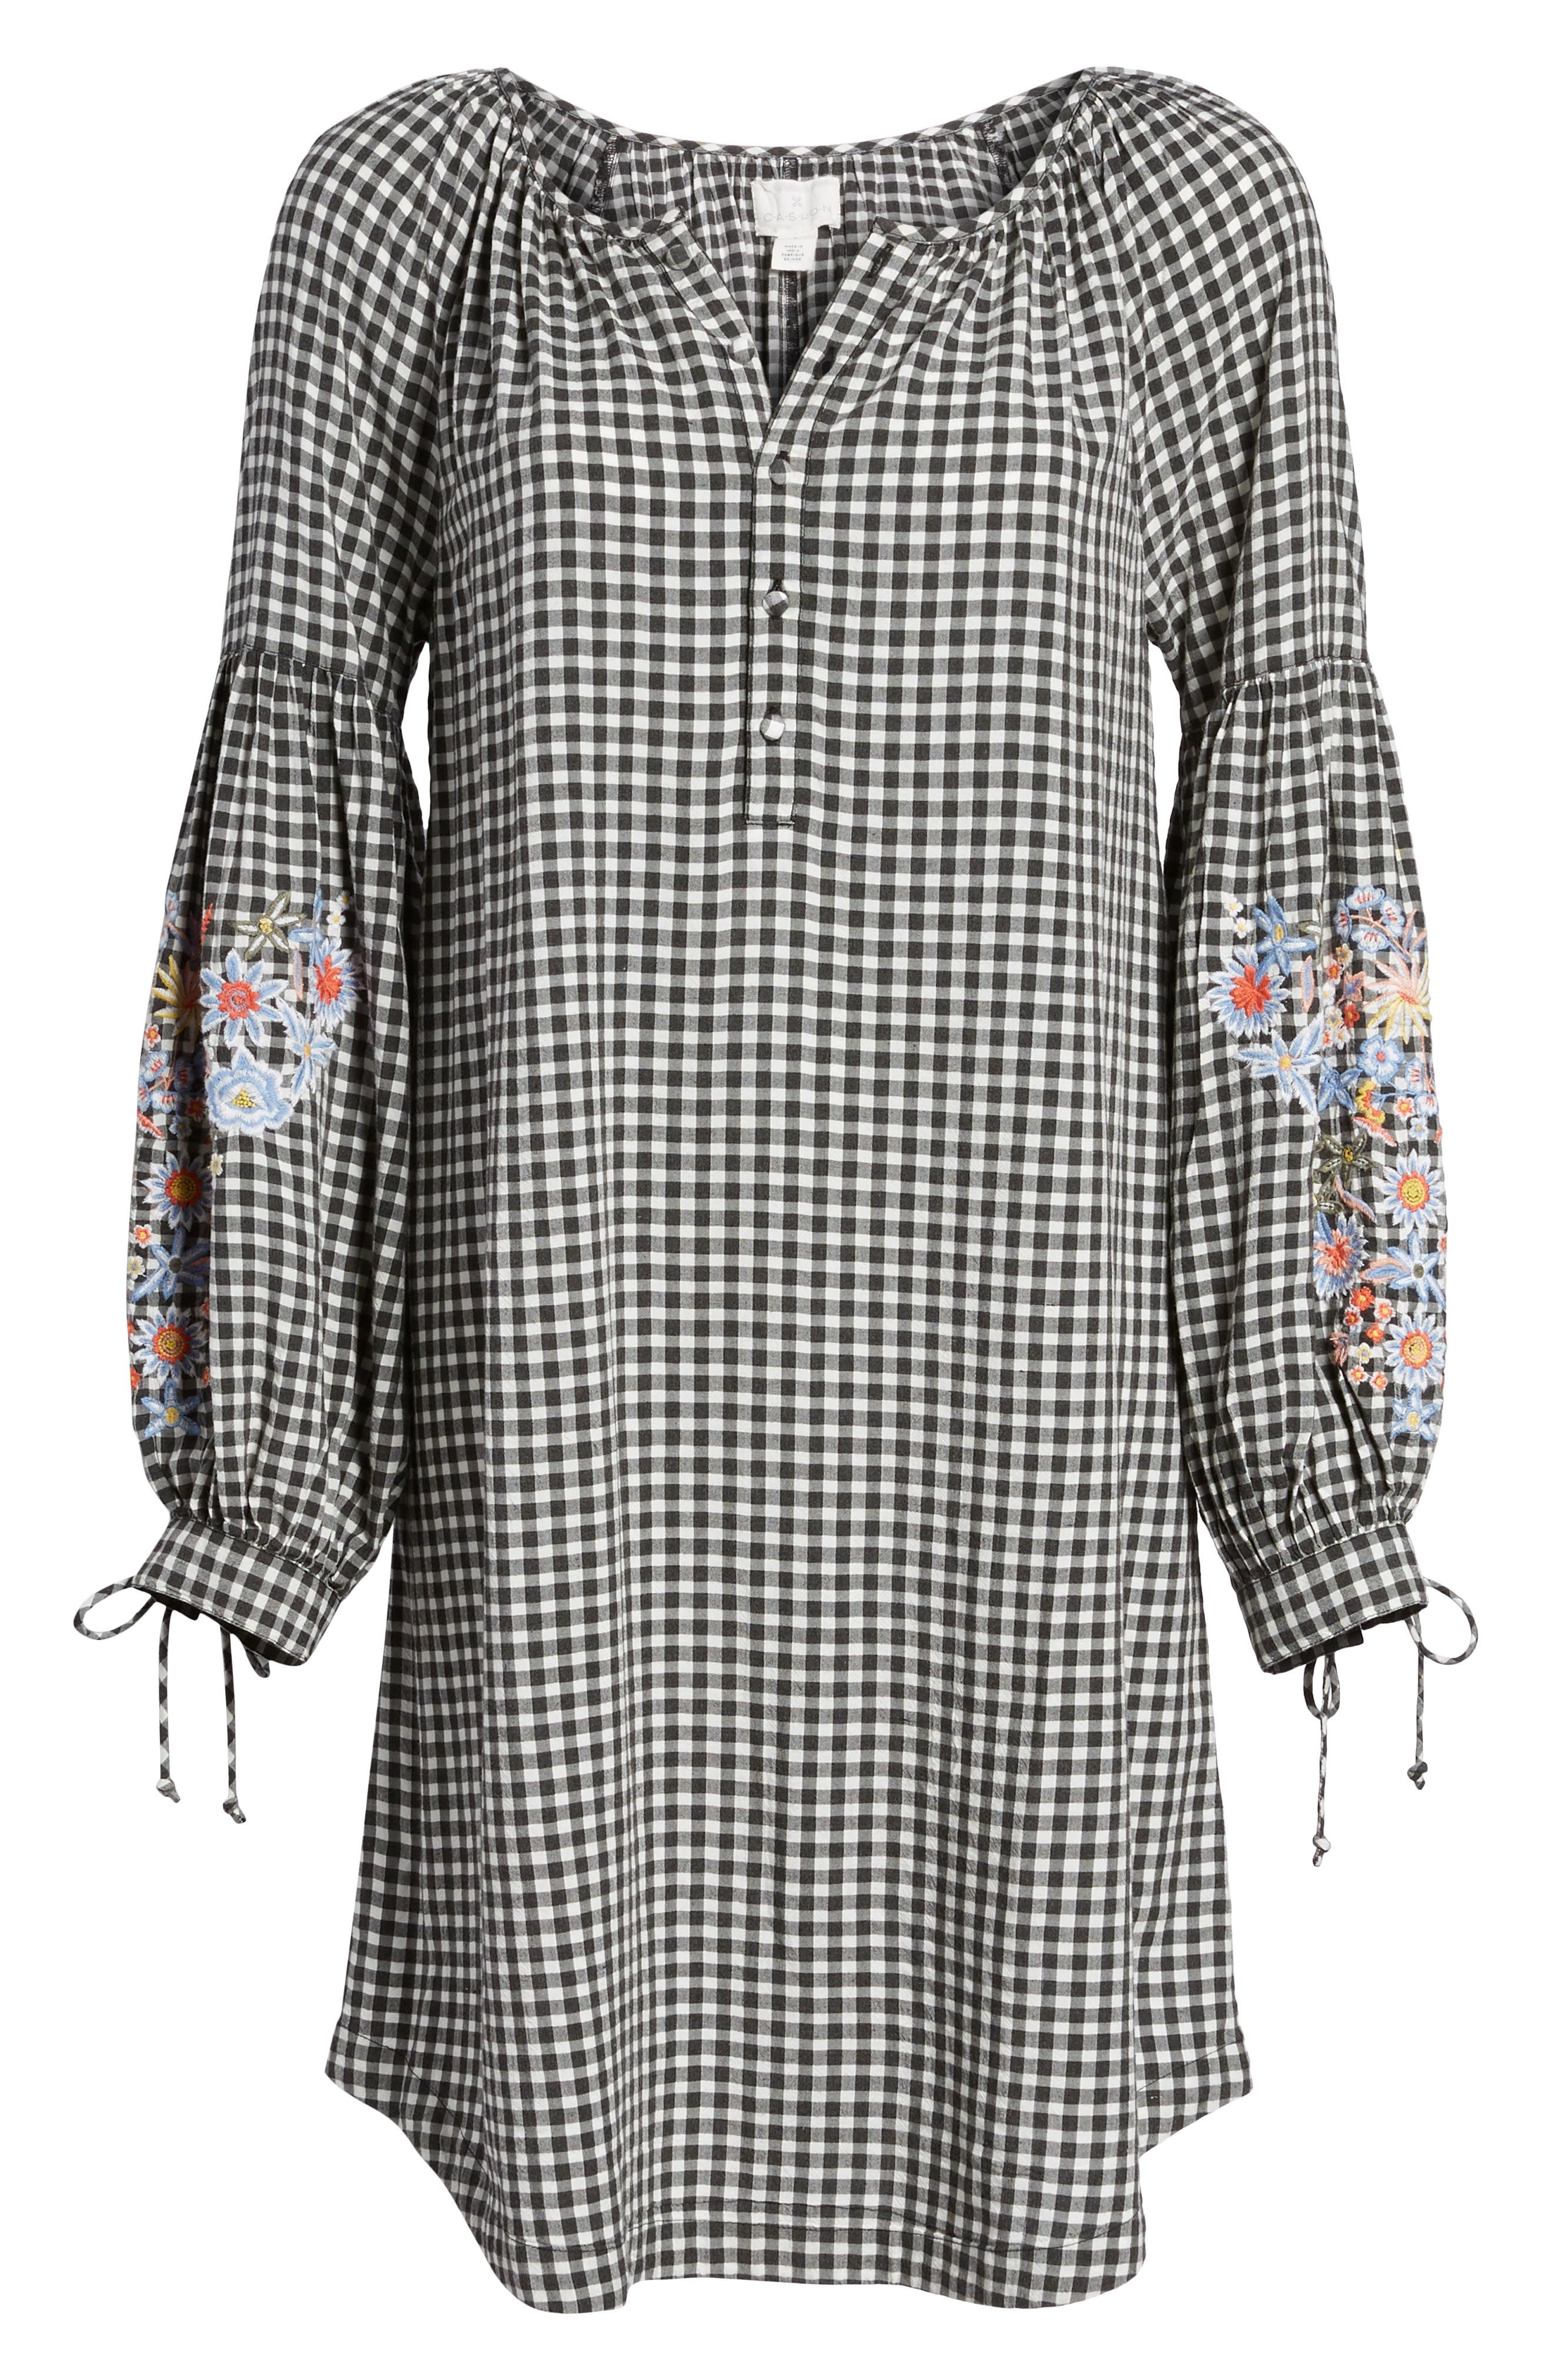 Embroidered Sleeve Shift Dress,                             Alternate thumbnail 6, color,                             Black-White Gingham